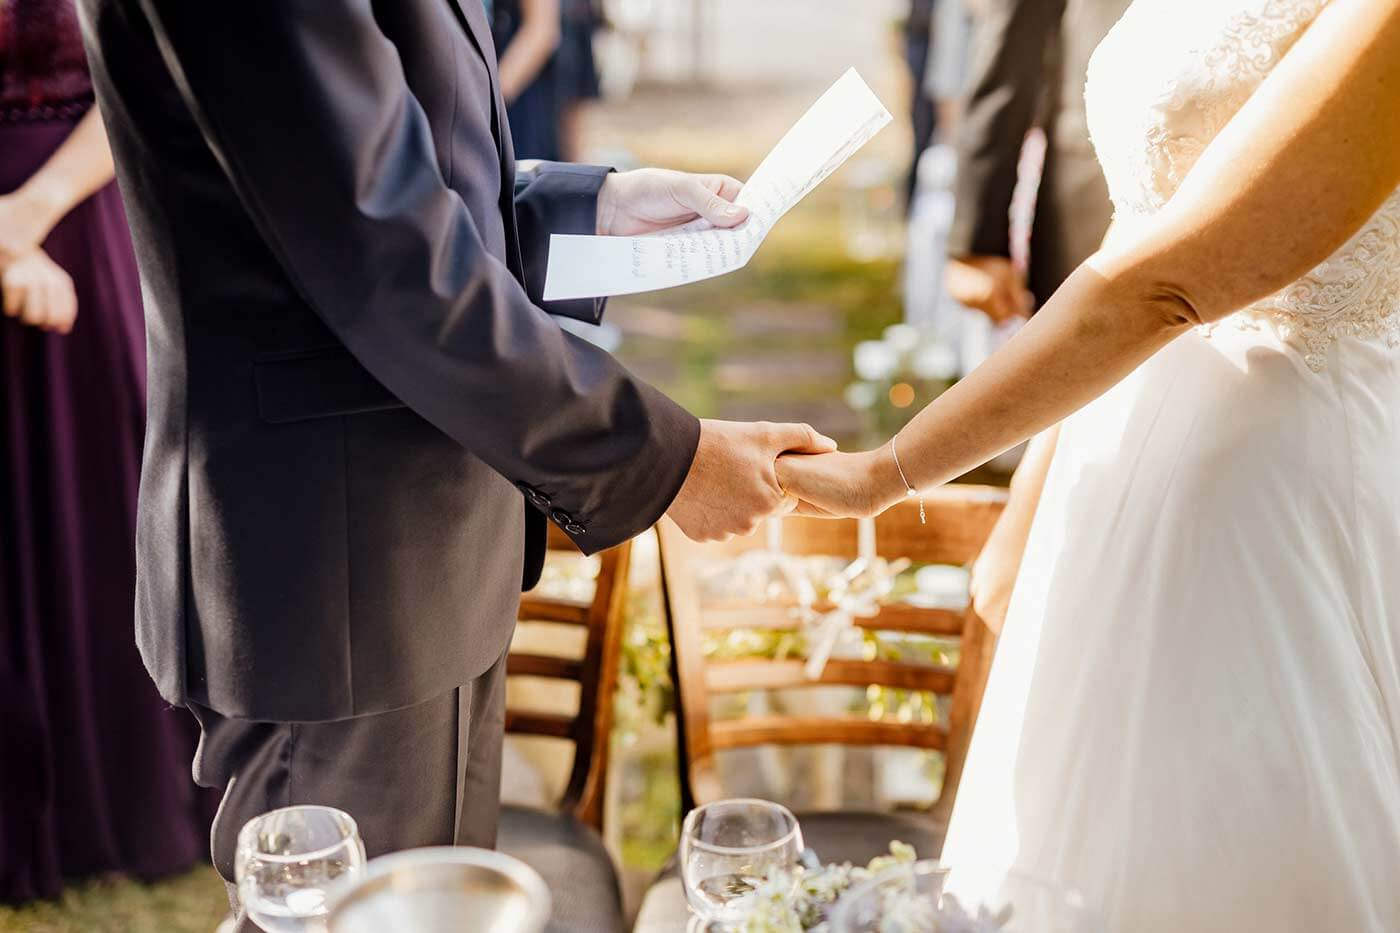 Fertige Eheversprechen